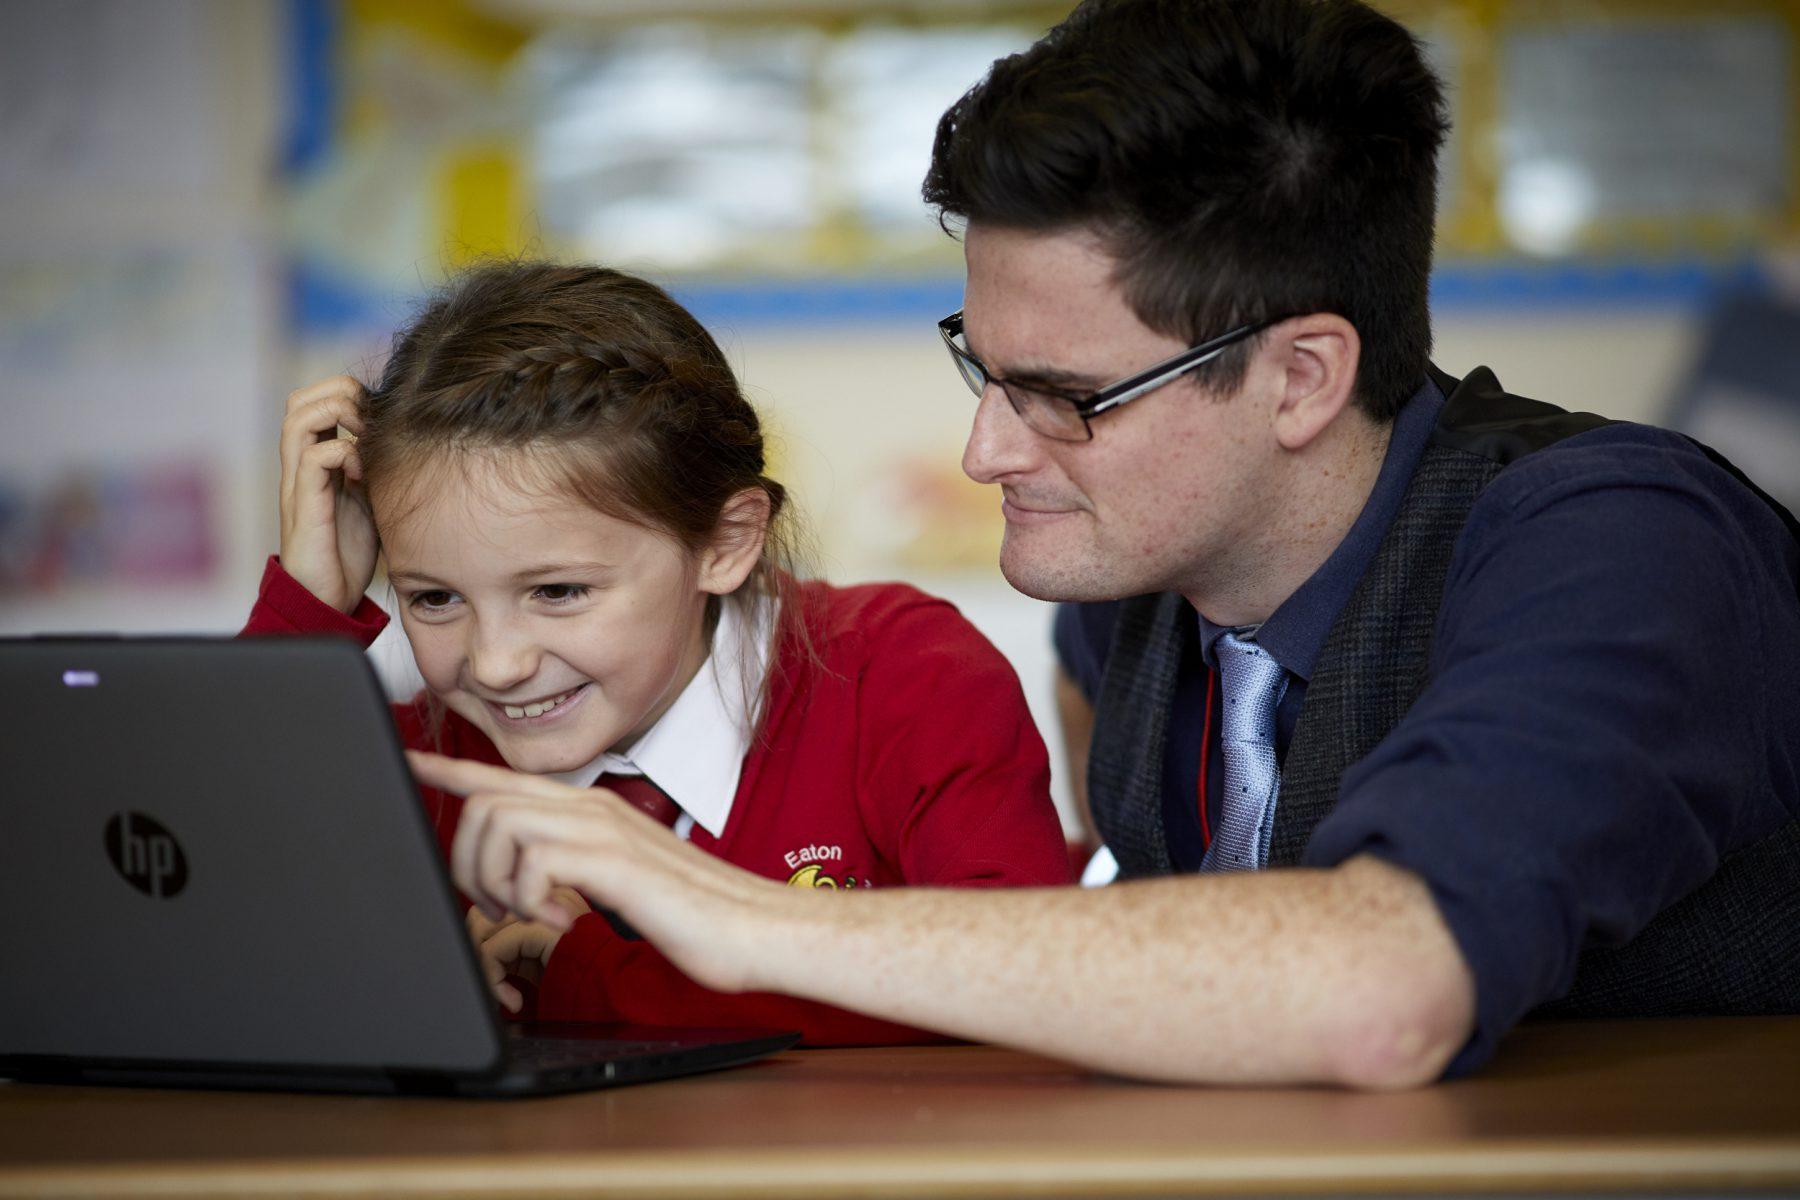 Reducing teacher workload - Eaton Primary School